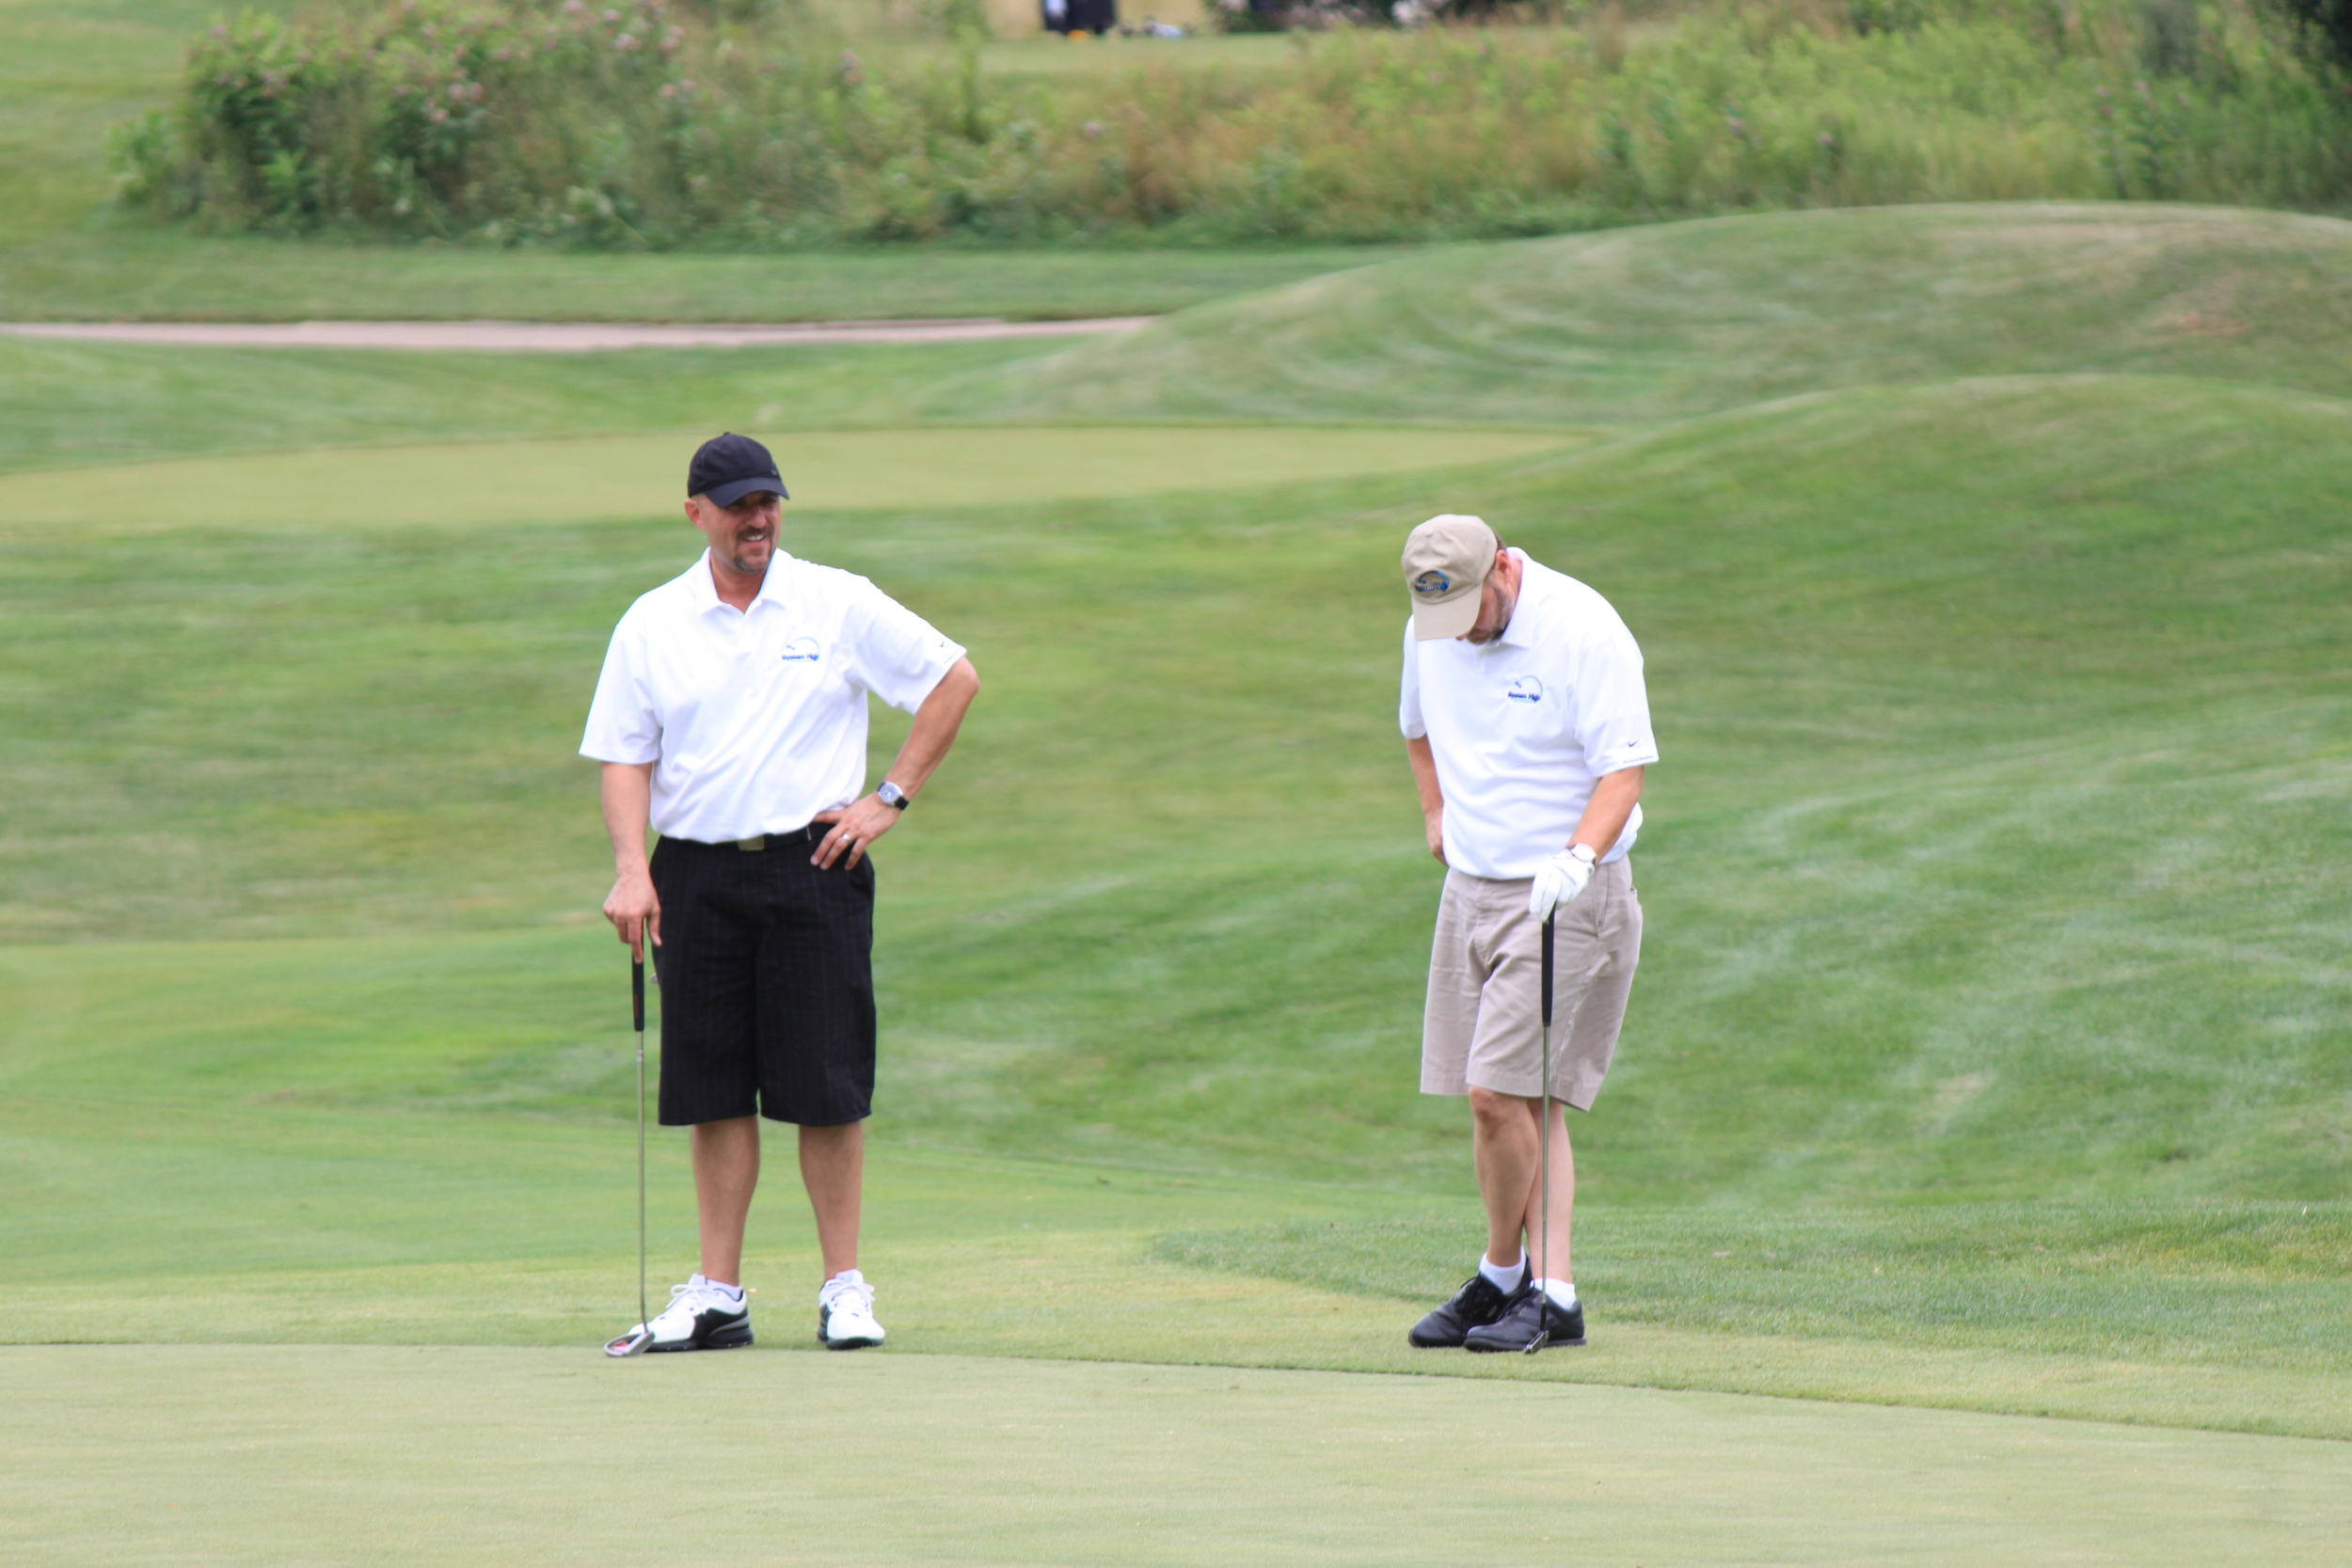 Dennis_Fitzgerald_Golf_Tournament_2011_IMG_3738.JPG